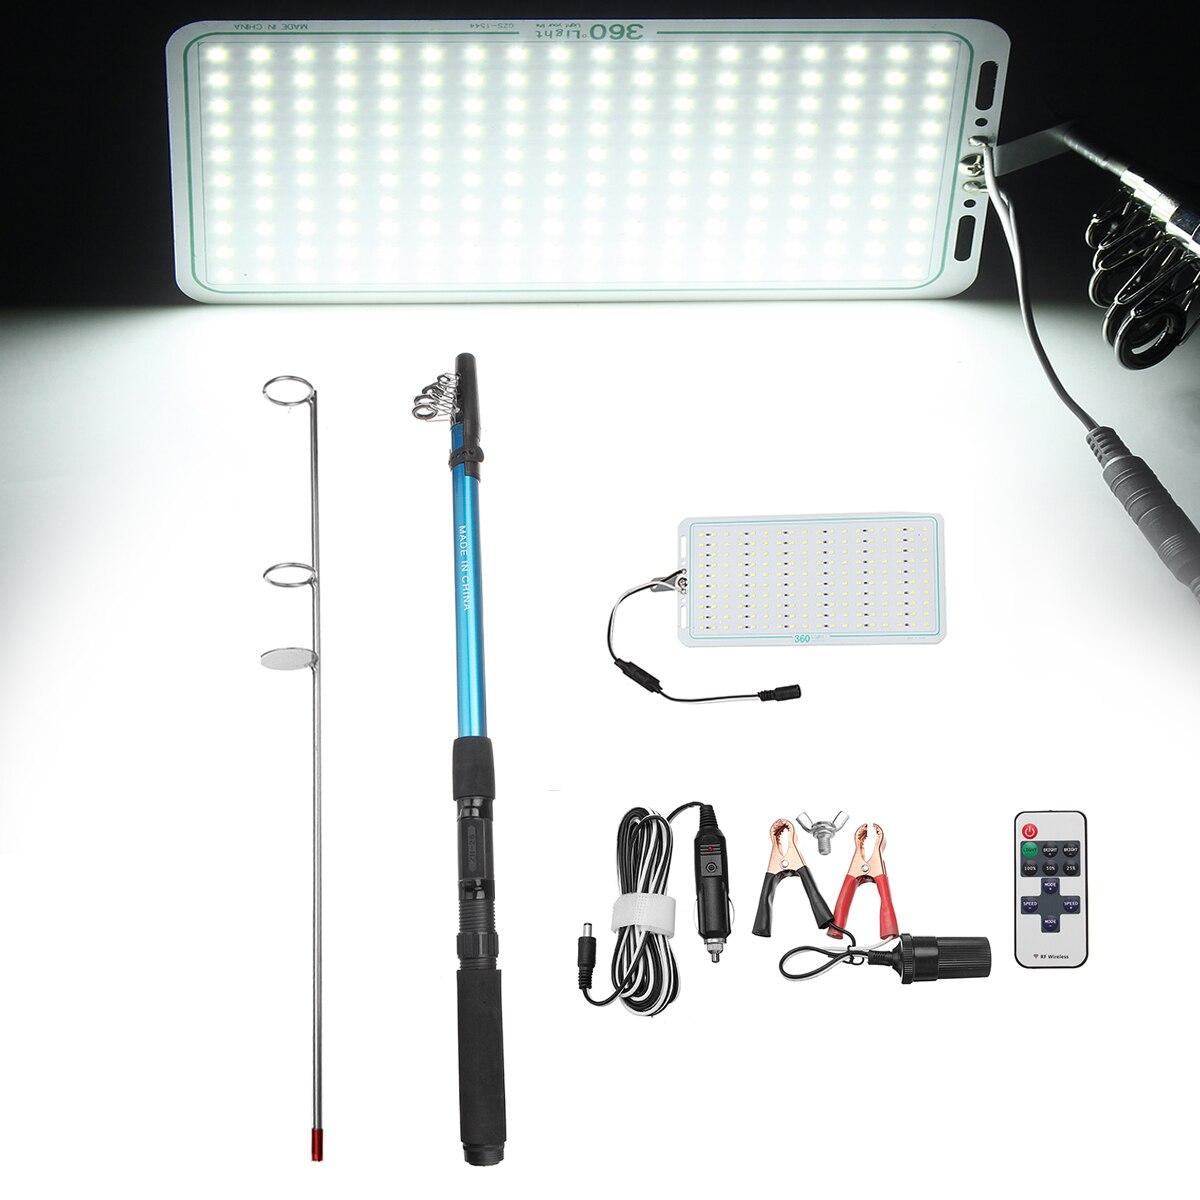 купить 5M Portable Camping Light Telescopic Fishing Rod Camping Lamp Light Car Repair LED Lantern Emergency Lamp по цене 2869.49 рублей